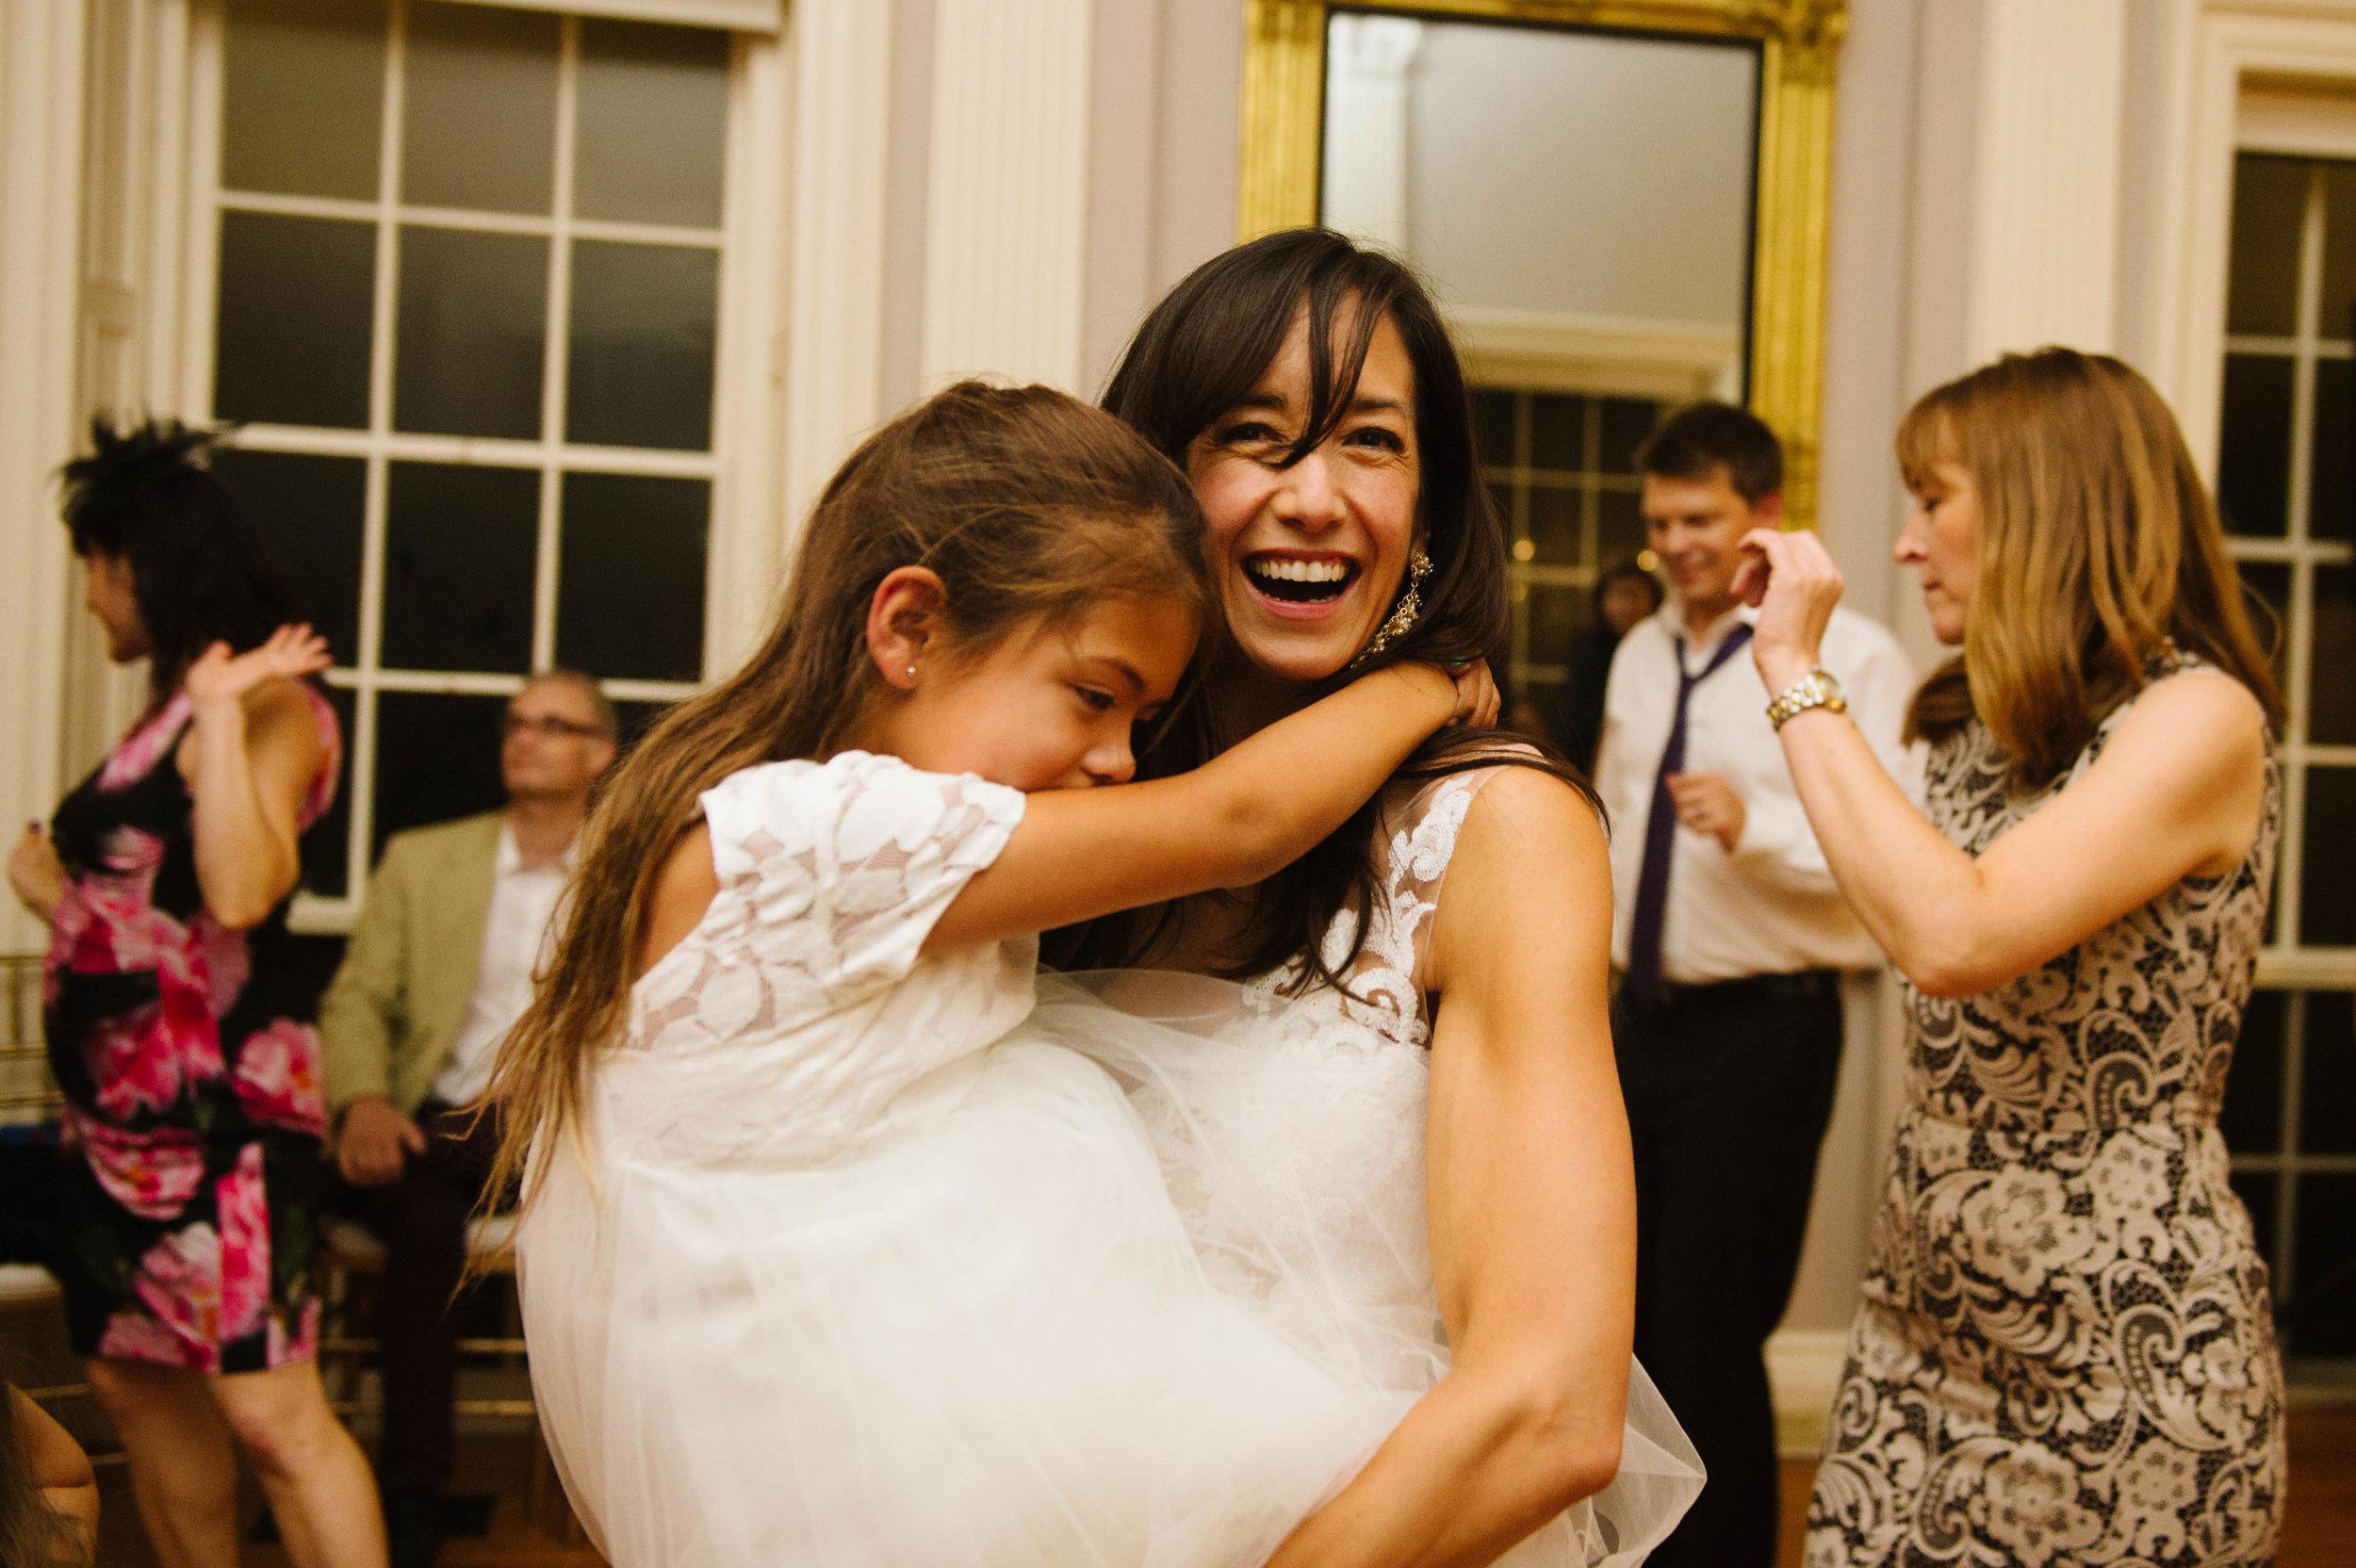 Candid-Wedding-Photography-Boston18.jpg